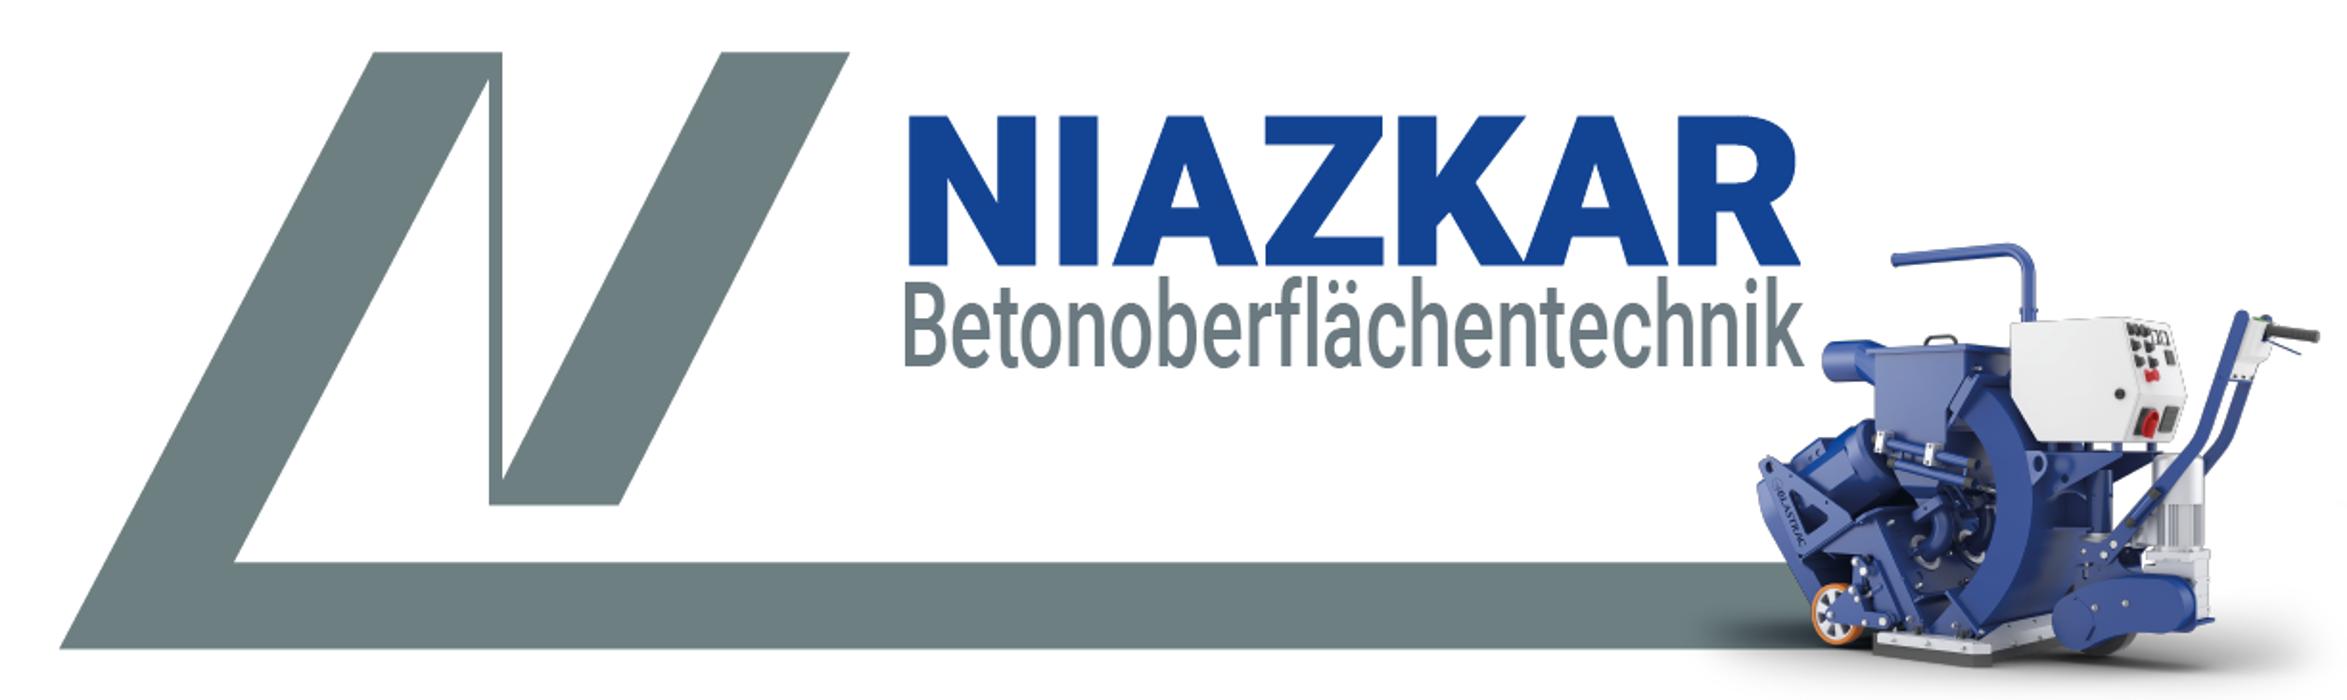 Bild zu Niazkar GmbH Betonoberflächentechnik in Köln